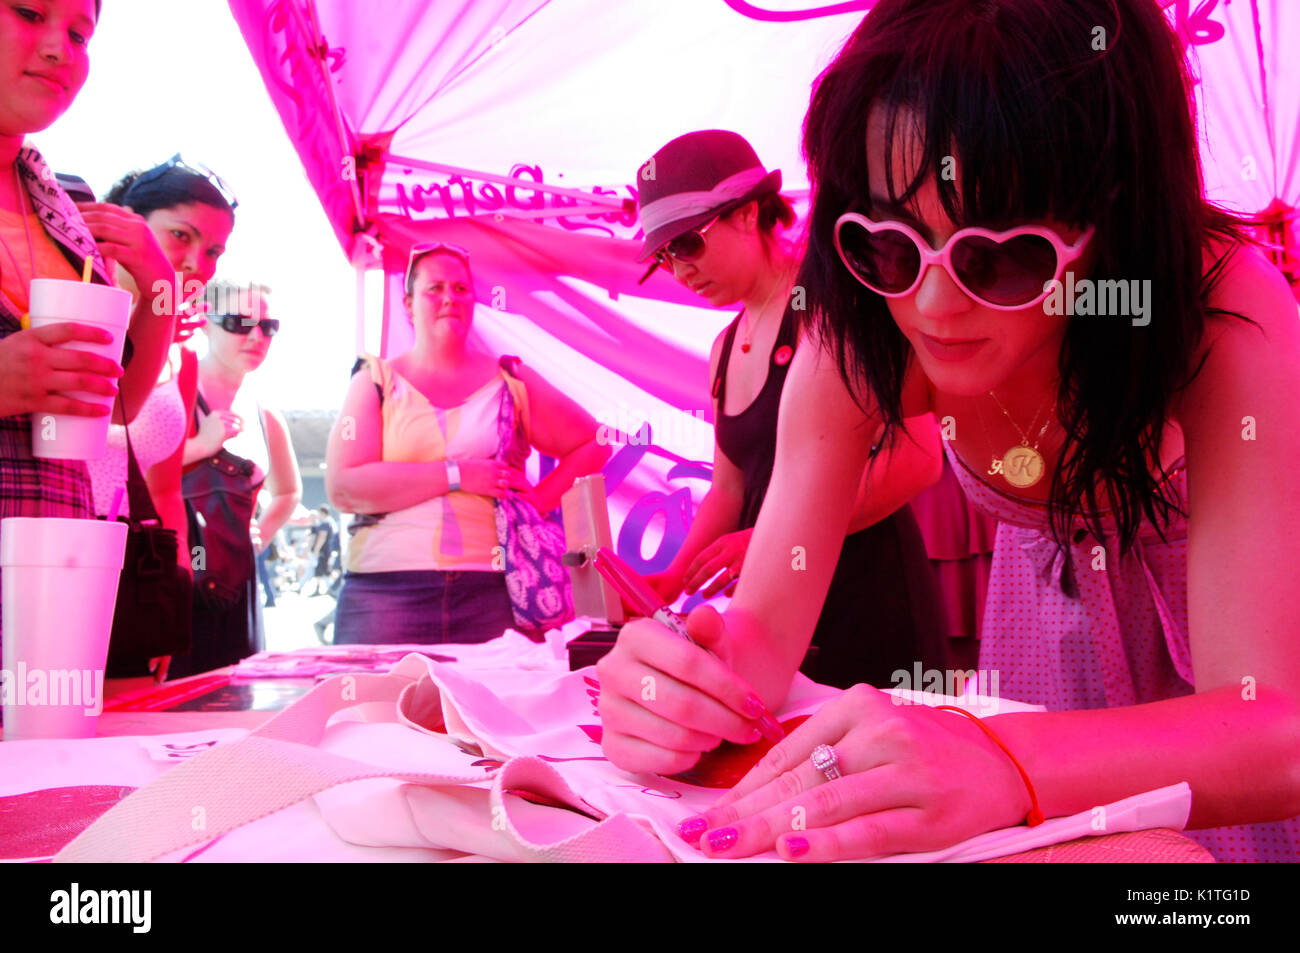 Singer Katy Perry backstage 2008 Vans Warped Tour Pomona Fairgrounds Pomona. - Stock Image